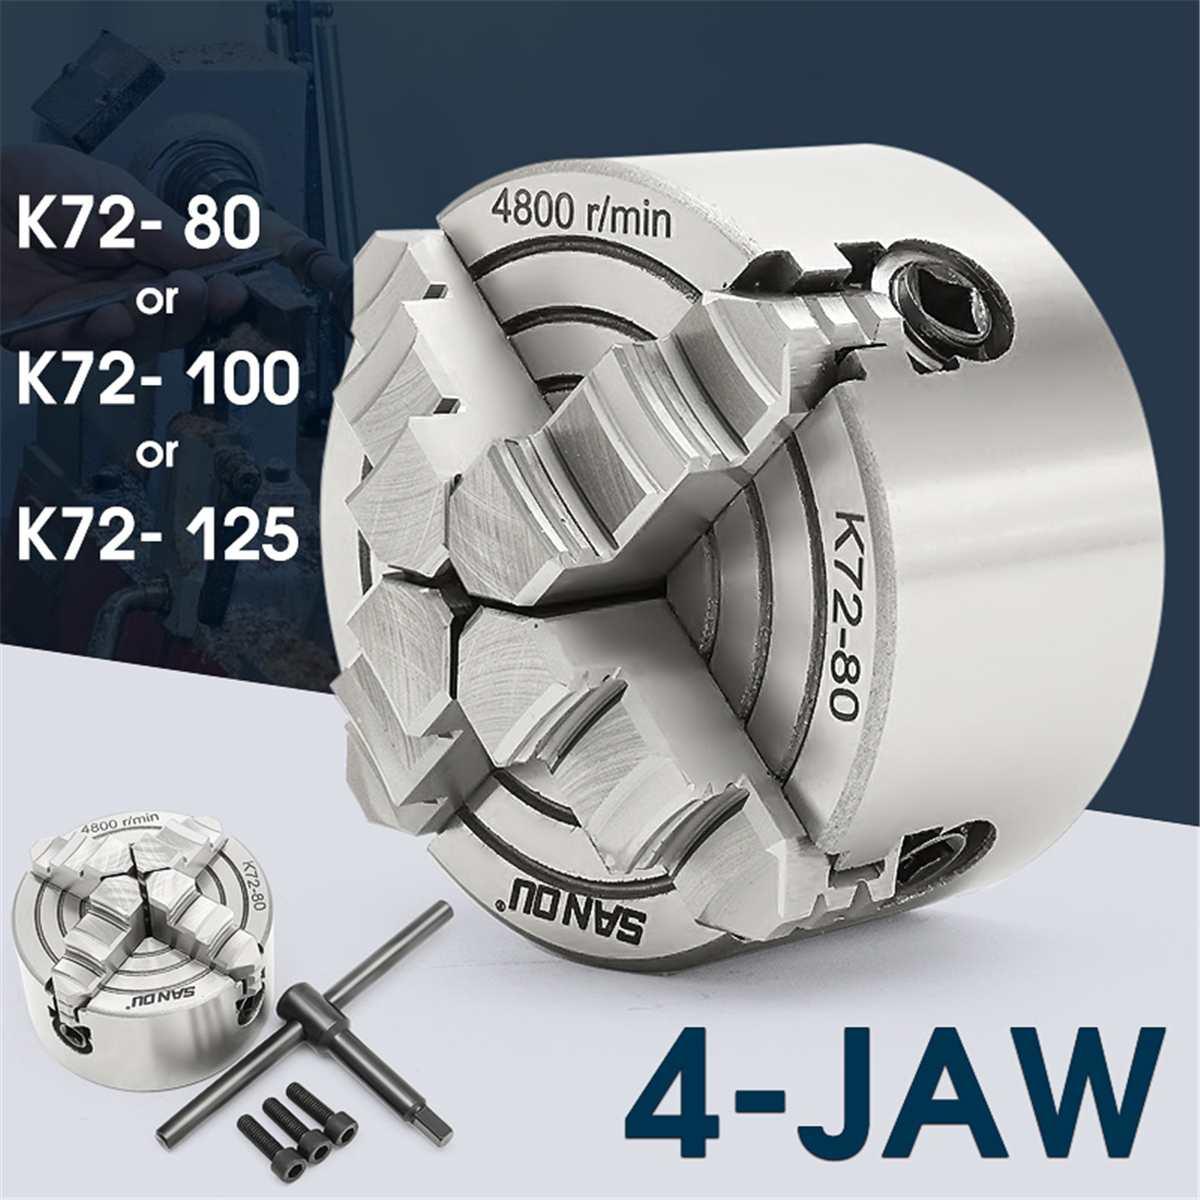 K72- 80/K72- 100/K72- 125 4 Jaw Lathe Chuck 80mm/100mm/125mm Independent Self-Centering 1pcs Safety Chuck Key 3pcs Mounting Bolt